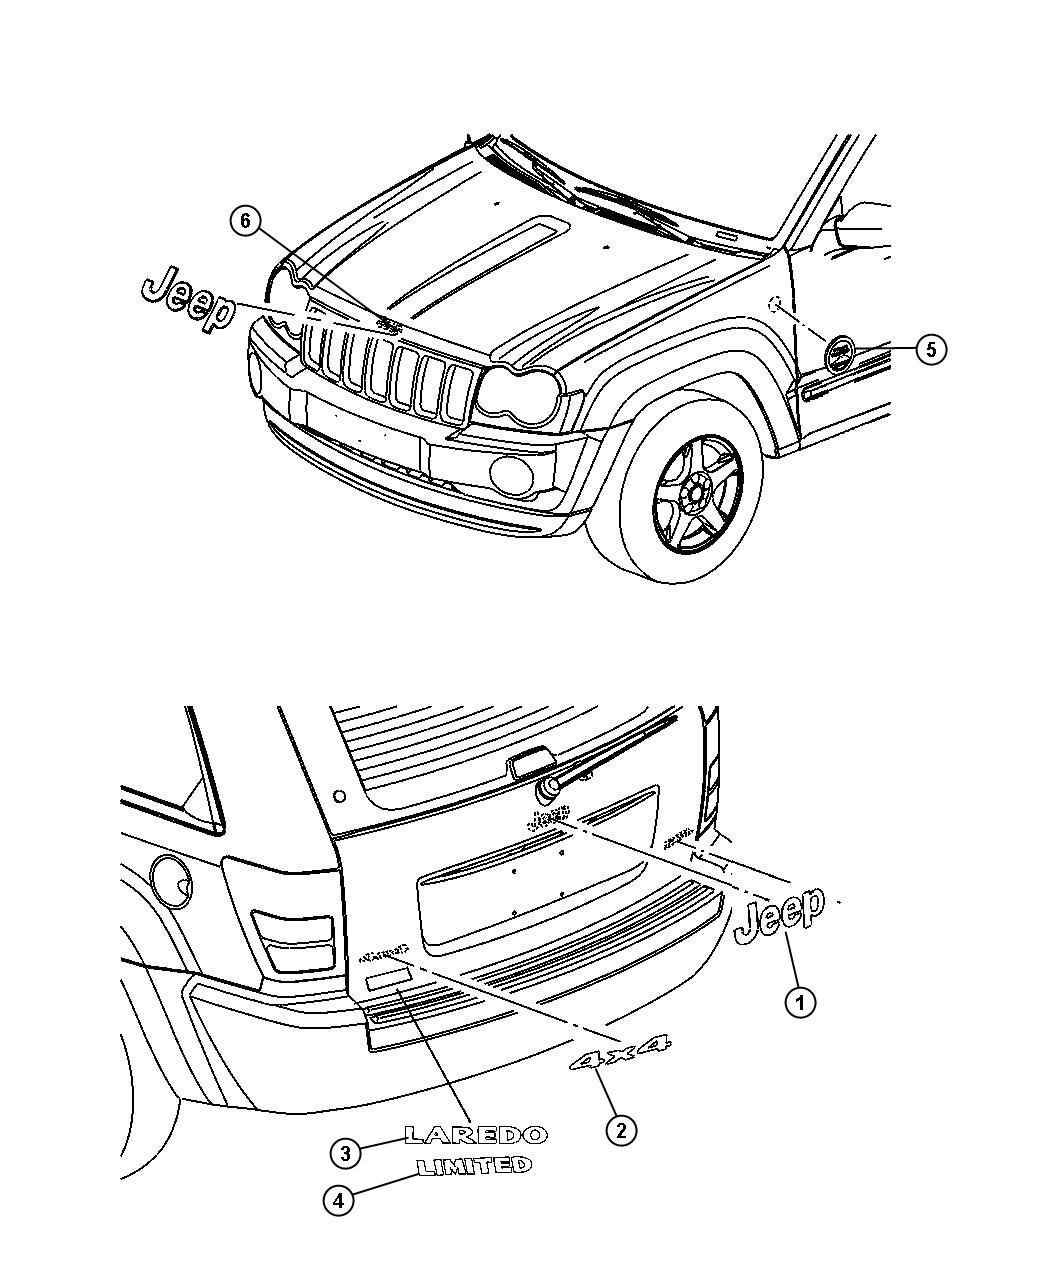 Jeep Liberty Nameplate. Hood. Jeep. Liftgate. [jeep badge